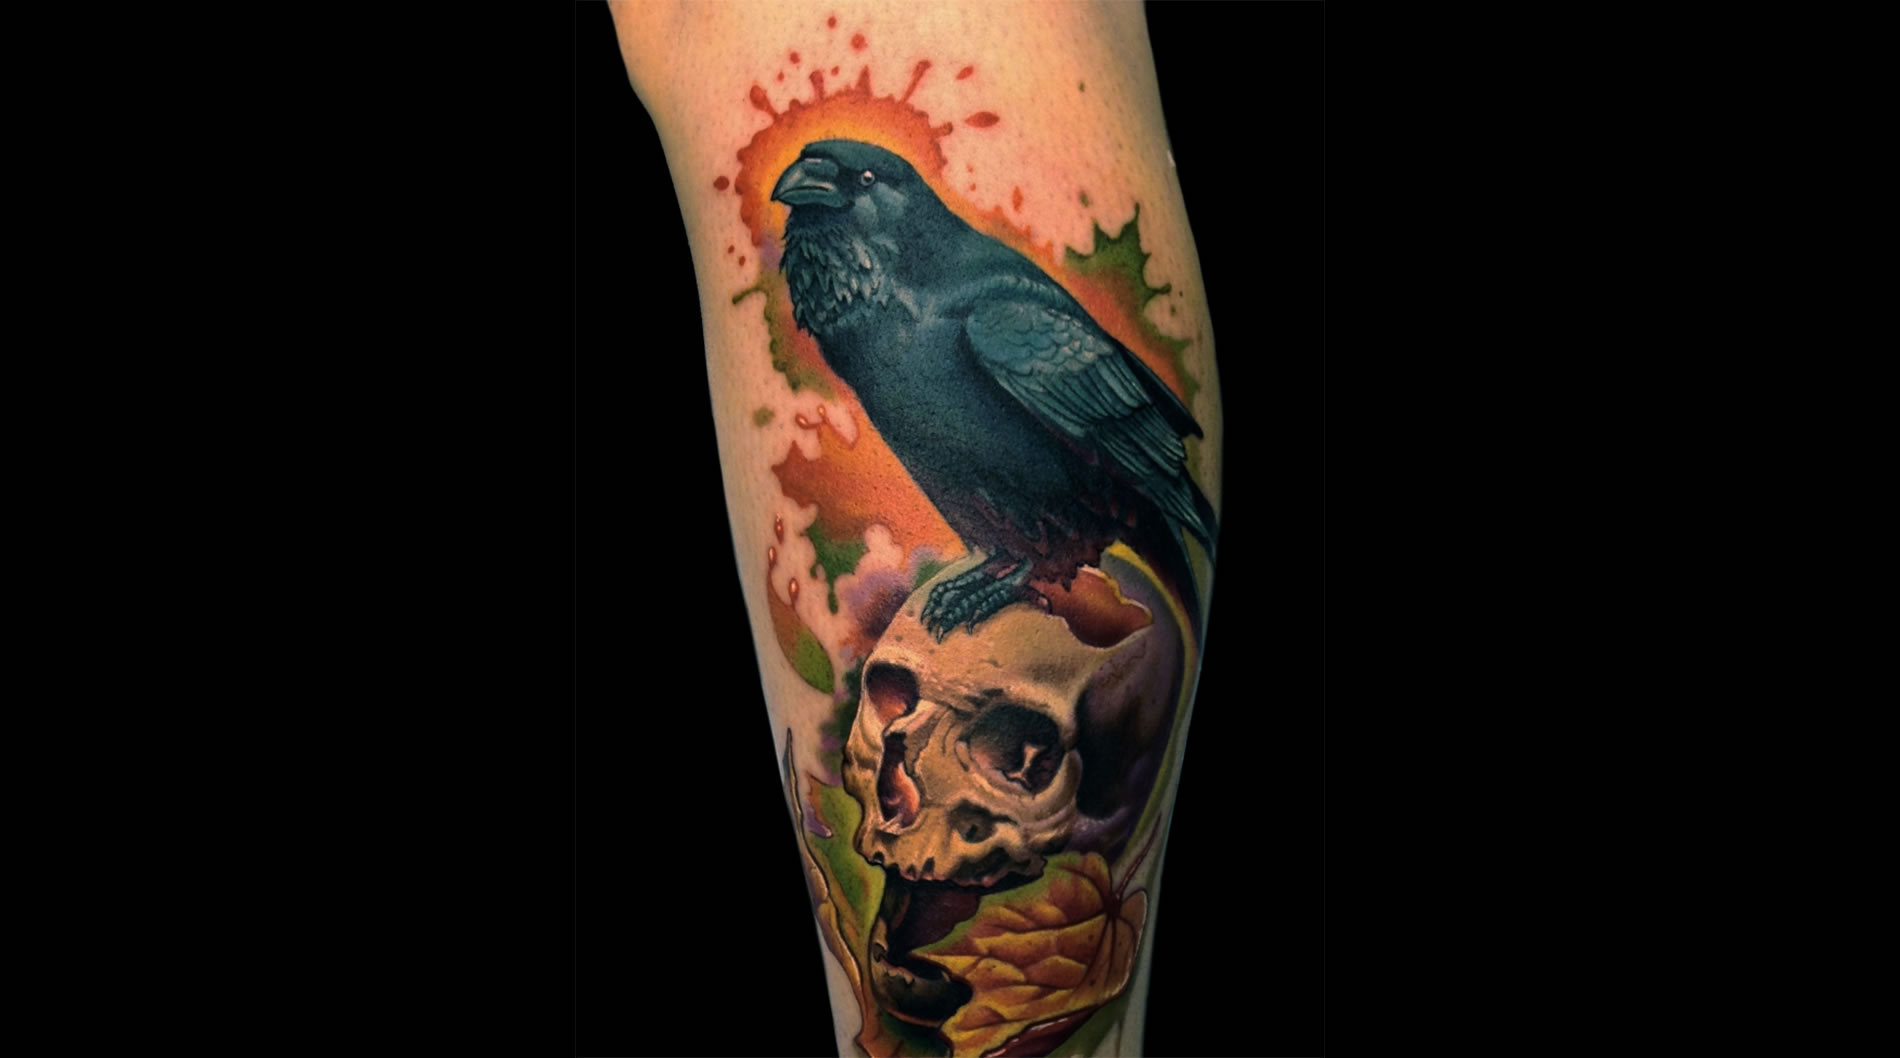 edgar poe, skull and crow tattoo